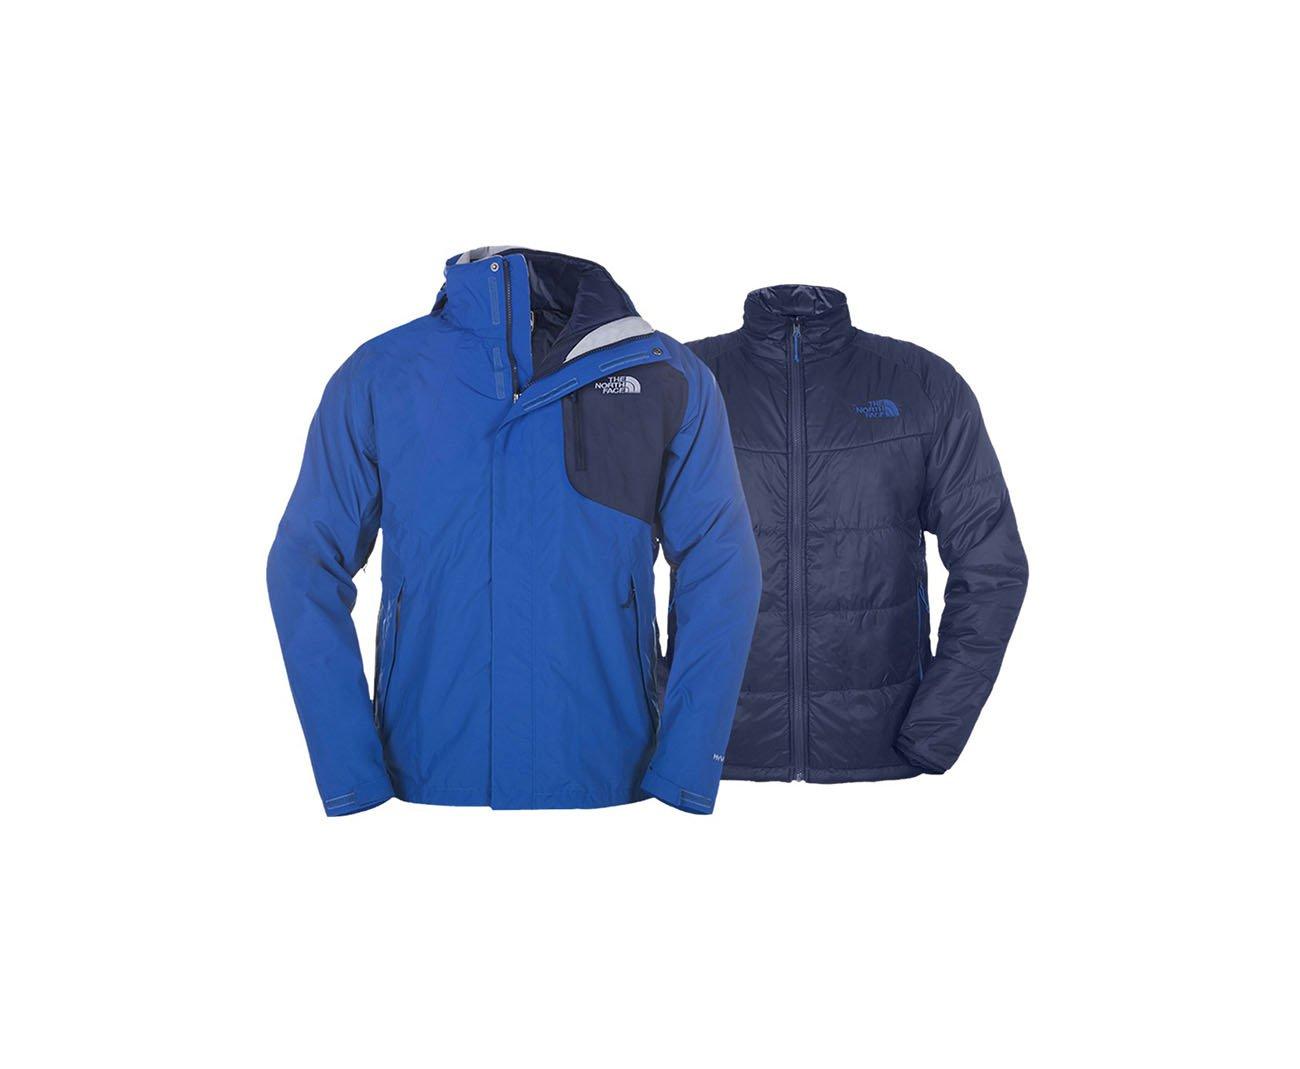 Jaqueta Carto Triclimate Masculina - Azul - The North Face